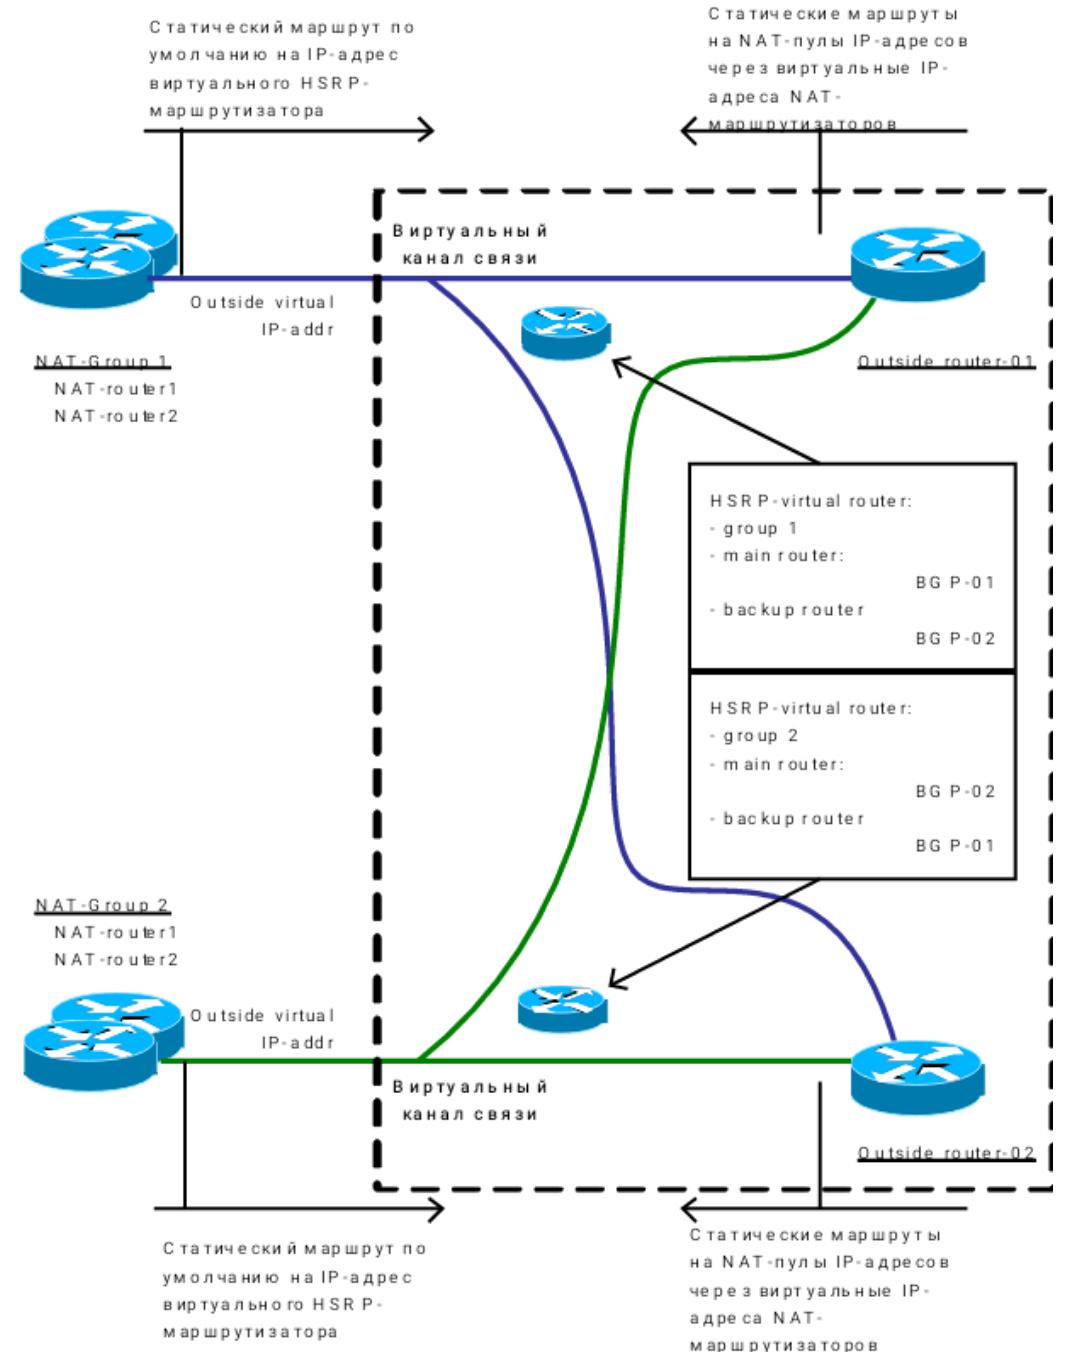 Балансировка трафика в IP-сетях оператора - 6